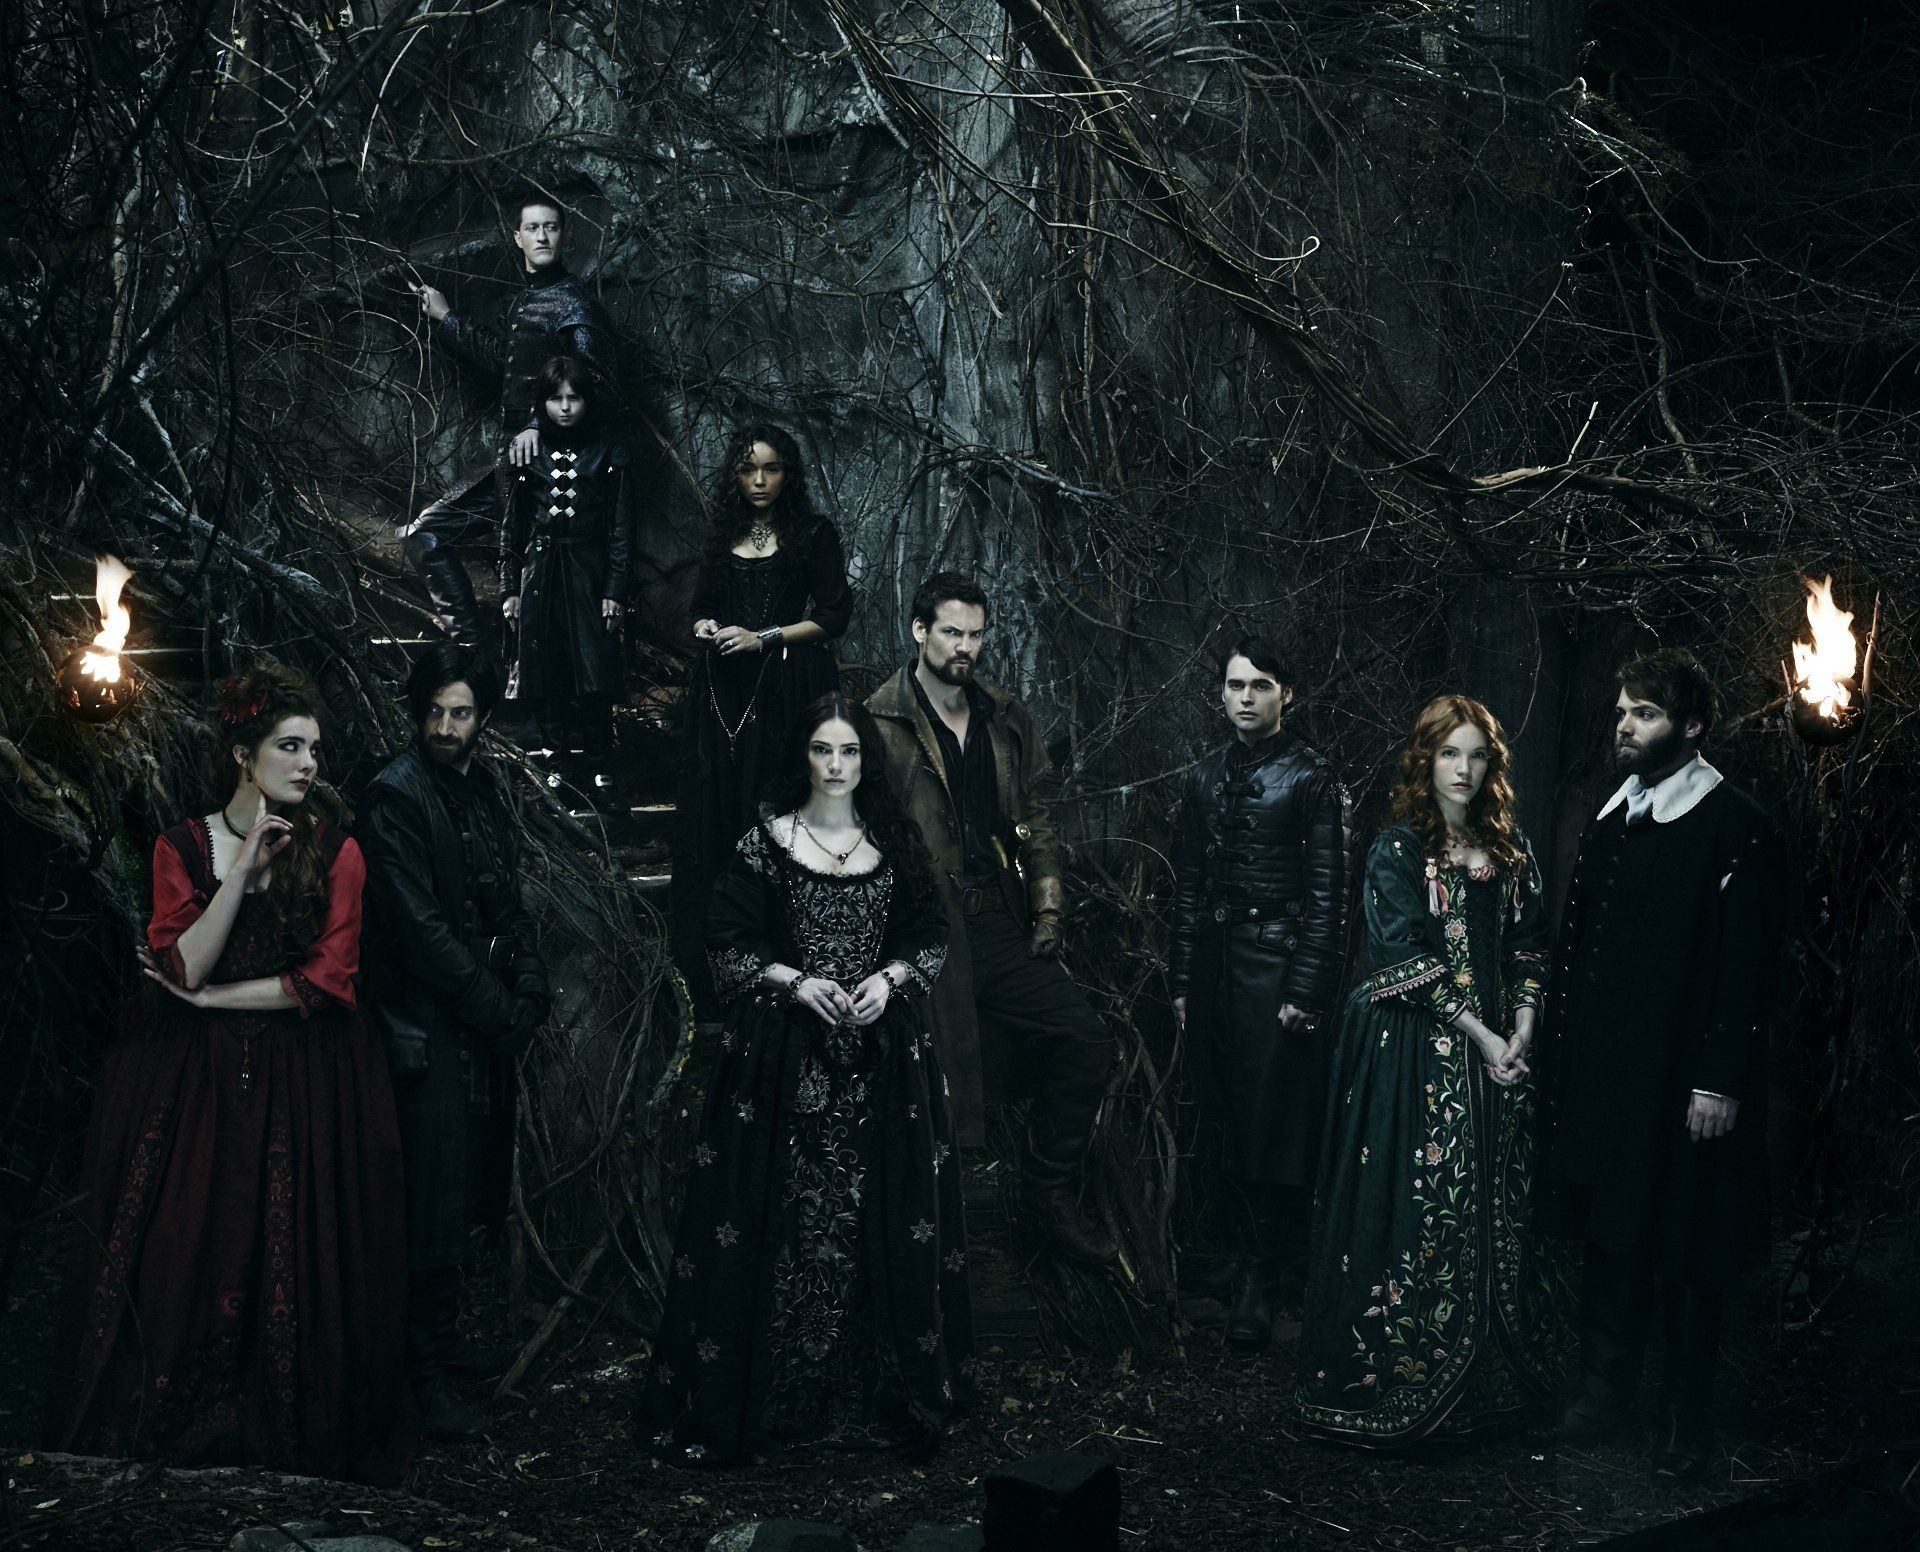 Salem - Season 3 - Group Photo